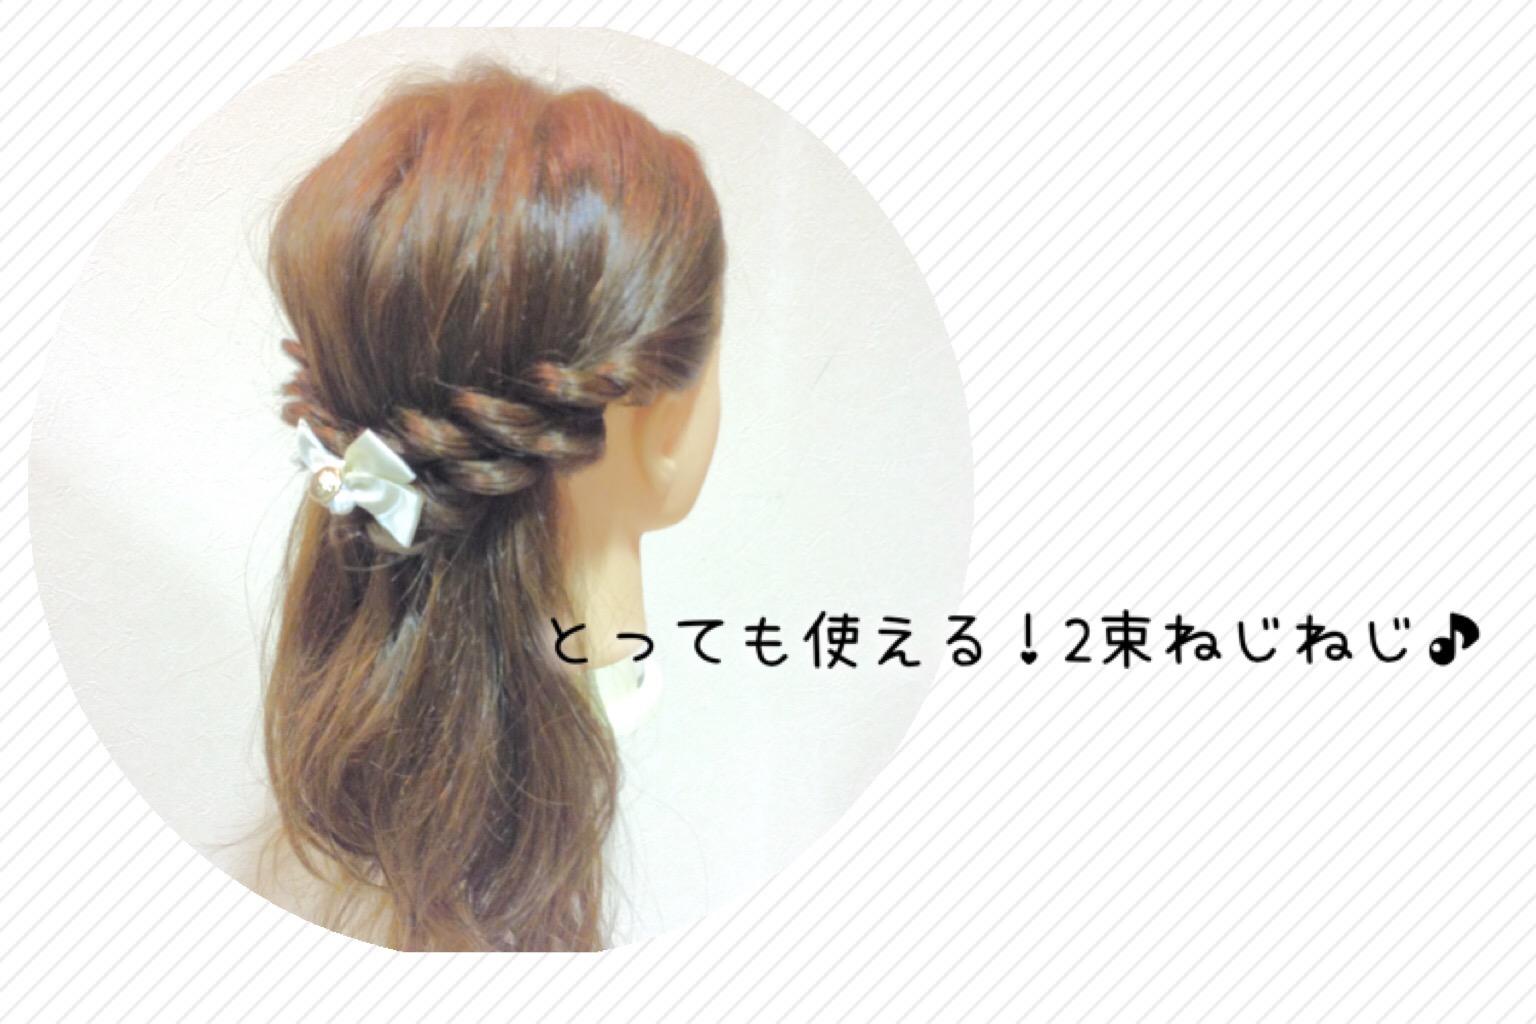 IMG_8323.JPG